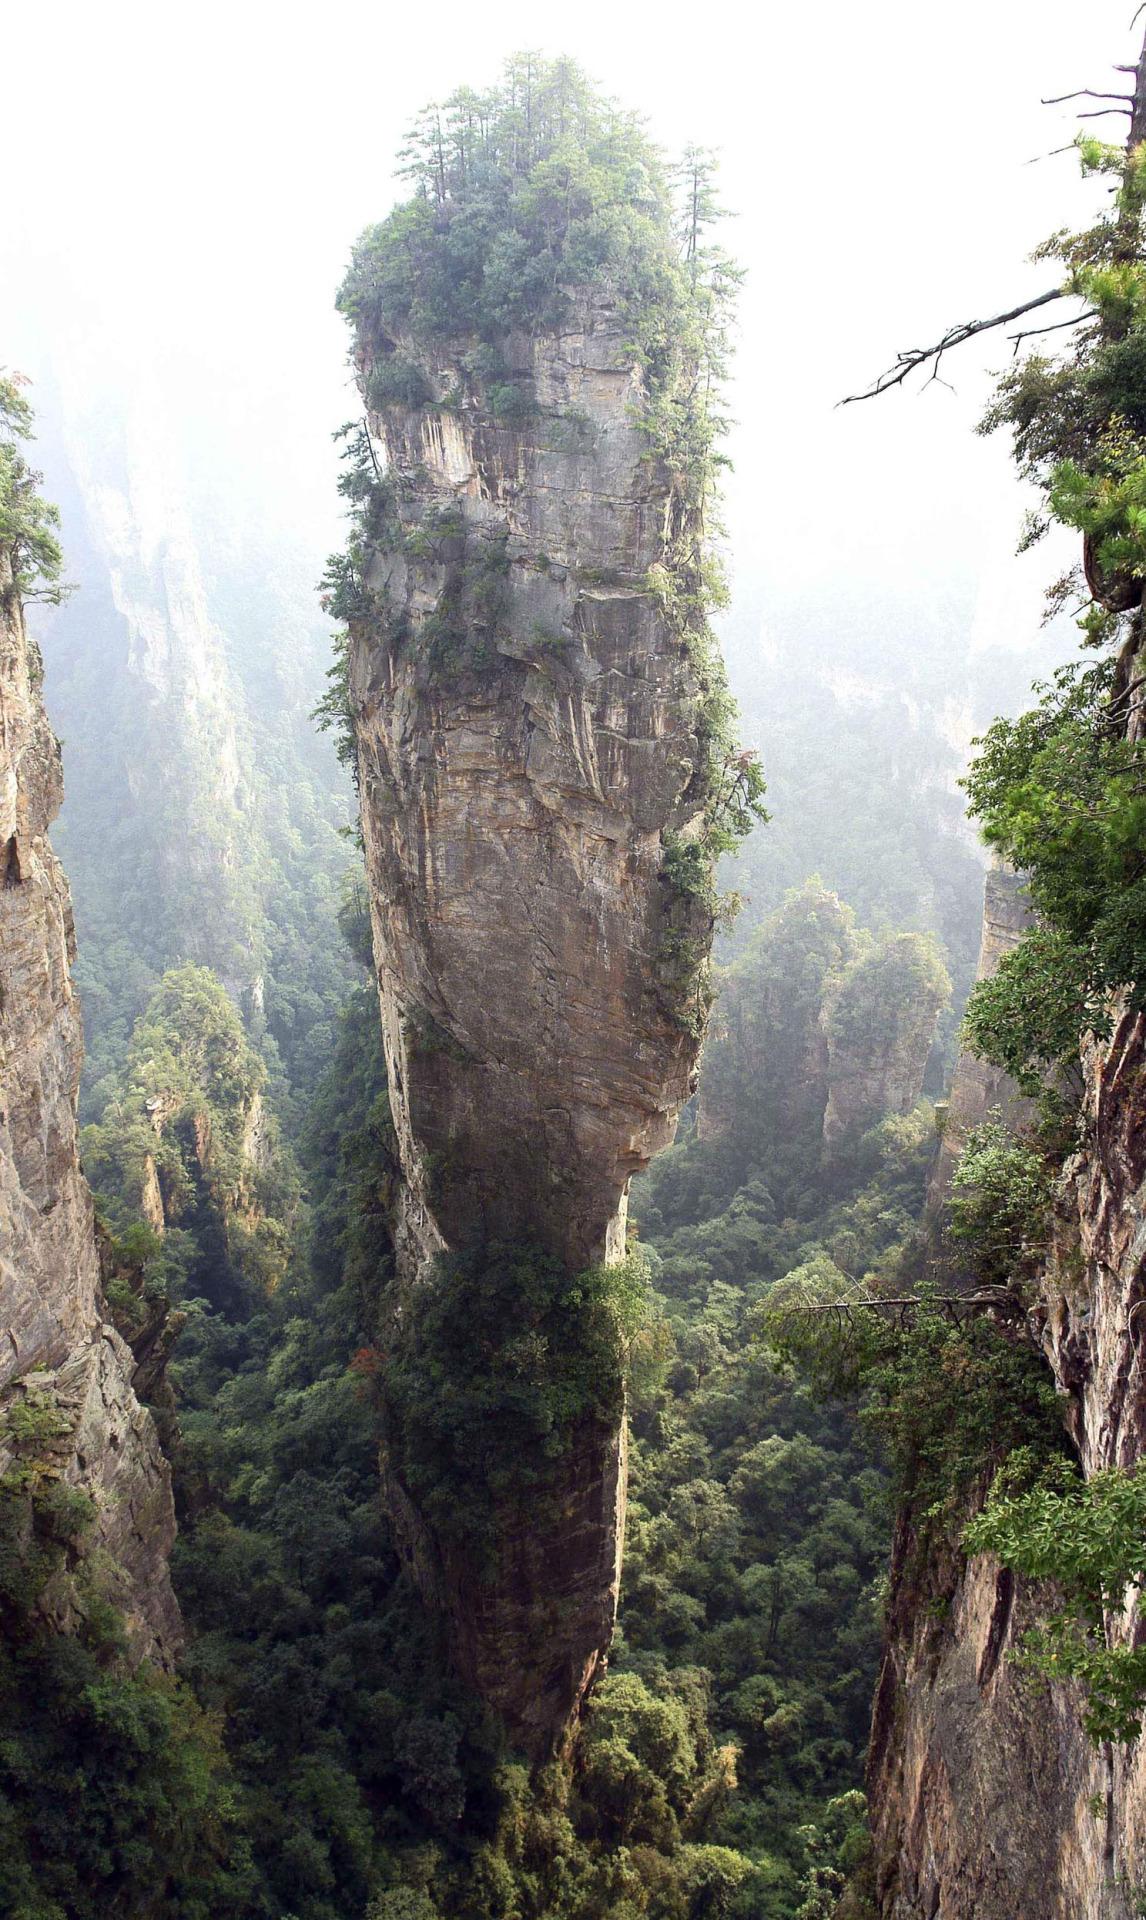 21 Zhangjiajie National Forest Park çin  Ölmeden önce görmeniz gereken 30 yer 21 Zhangjiajie National Forest Park  C3 A7in